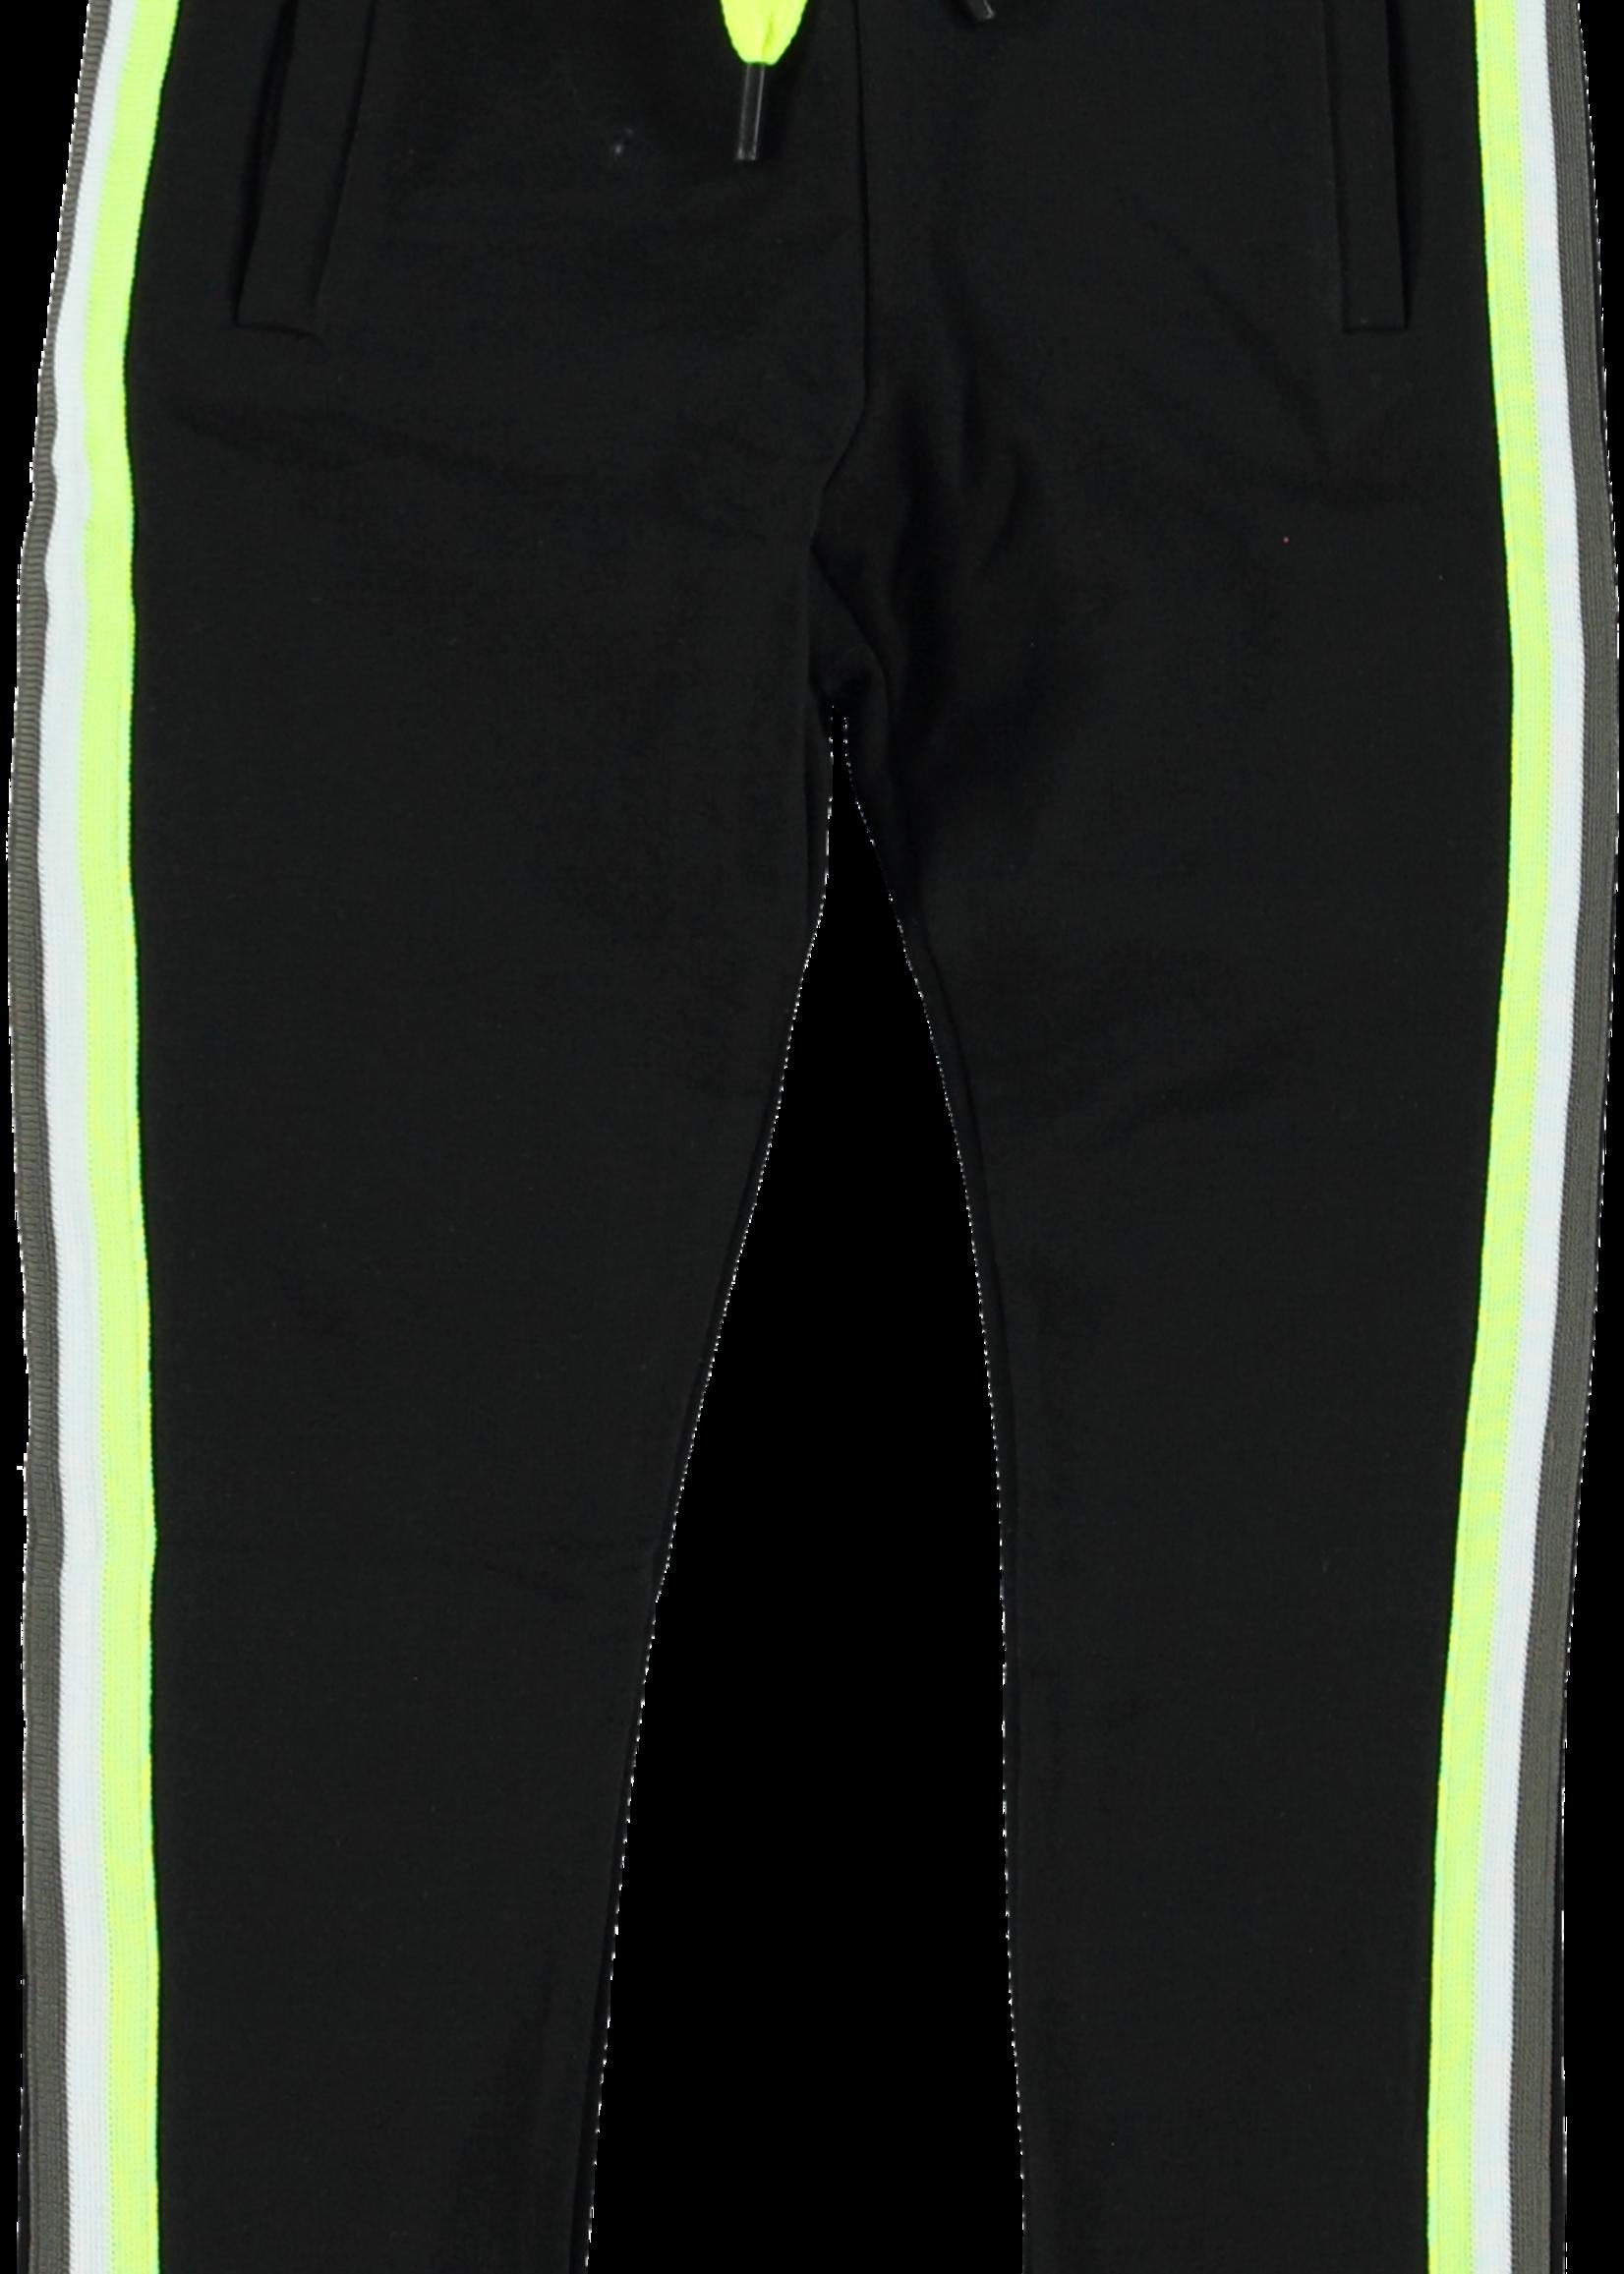 B'chill Bchill Guus jogpants long